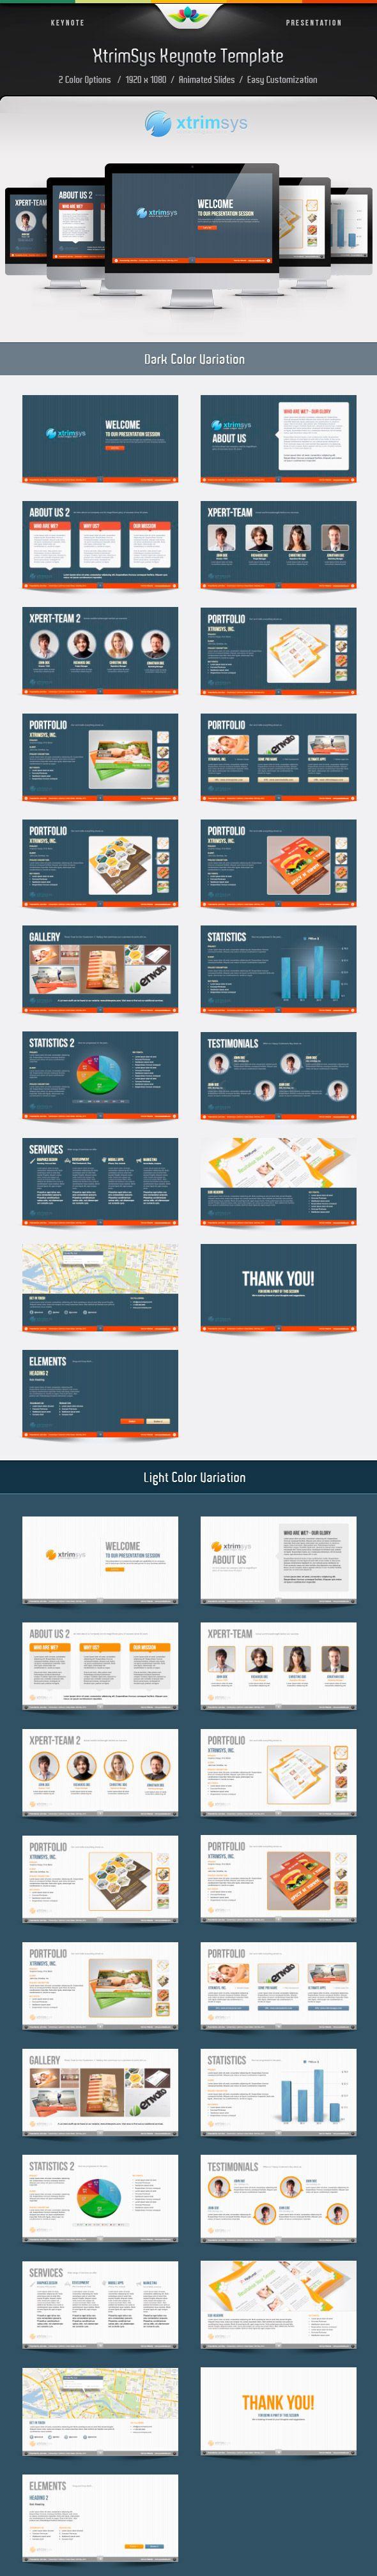 27 best keynote presentation images on pinterest templates xtrimsys keynote template by saptarang on deviantart toneelgroepblik Choice Image